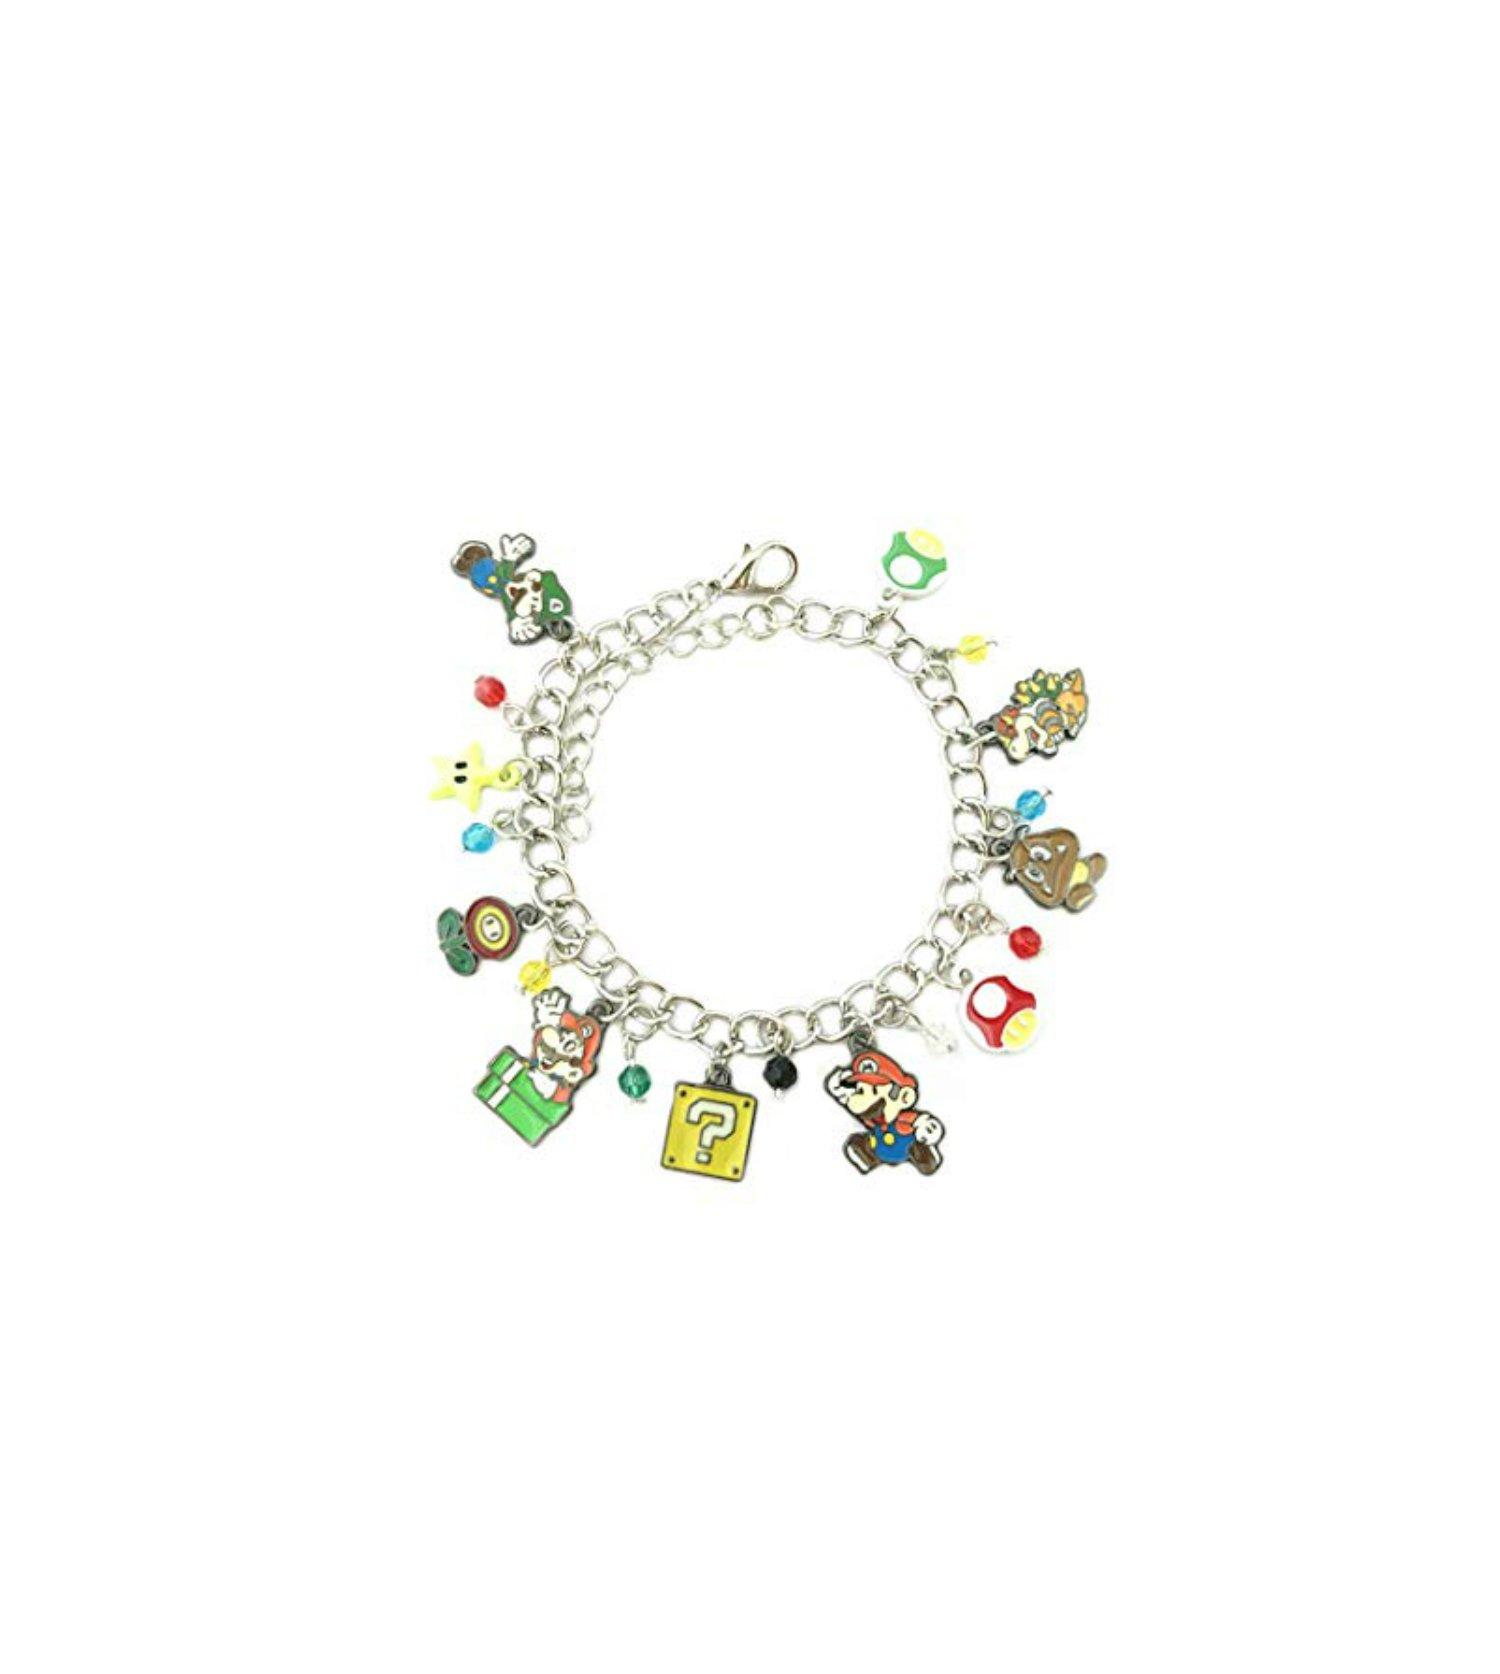 Athena Brand Mario Brothers Video Game Series Superhero Theme Logo Charm Jewelry Bracelet w/Gift Box by